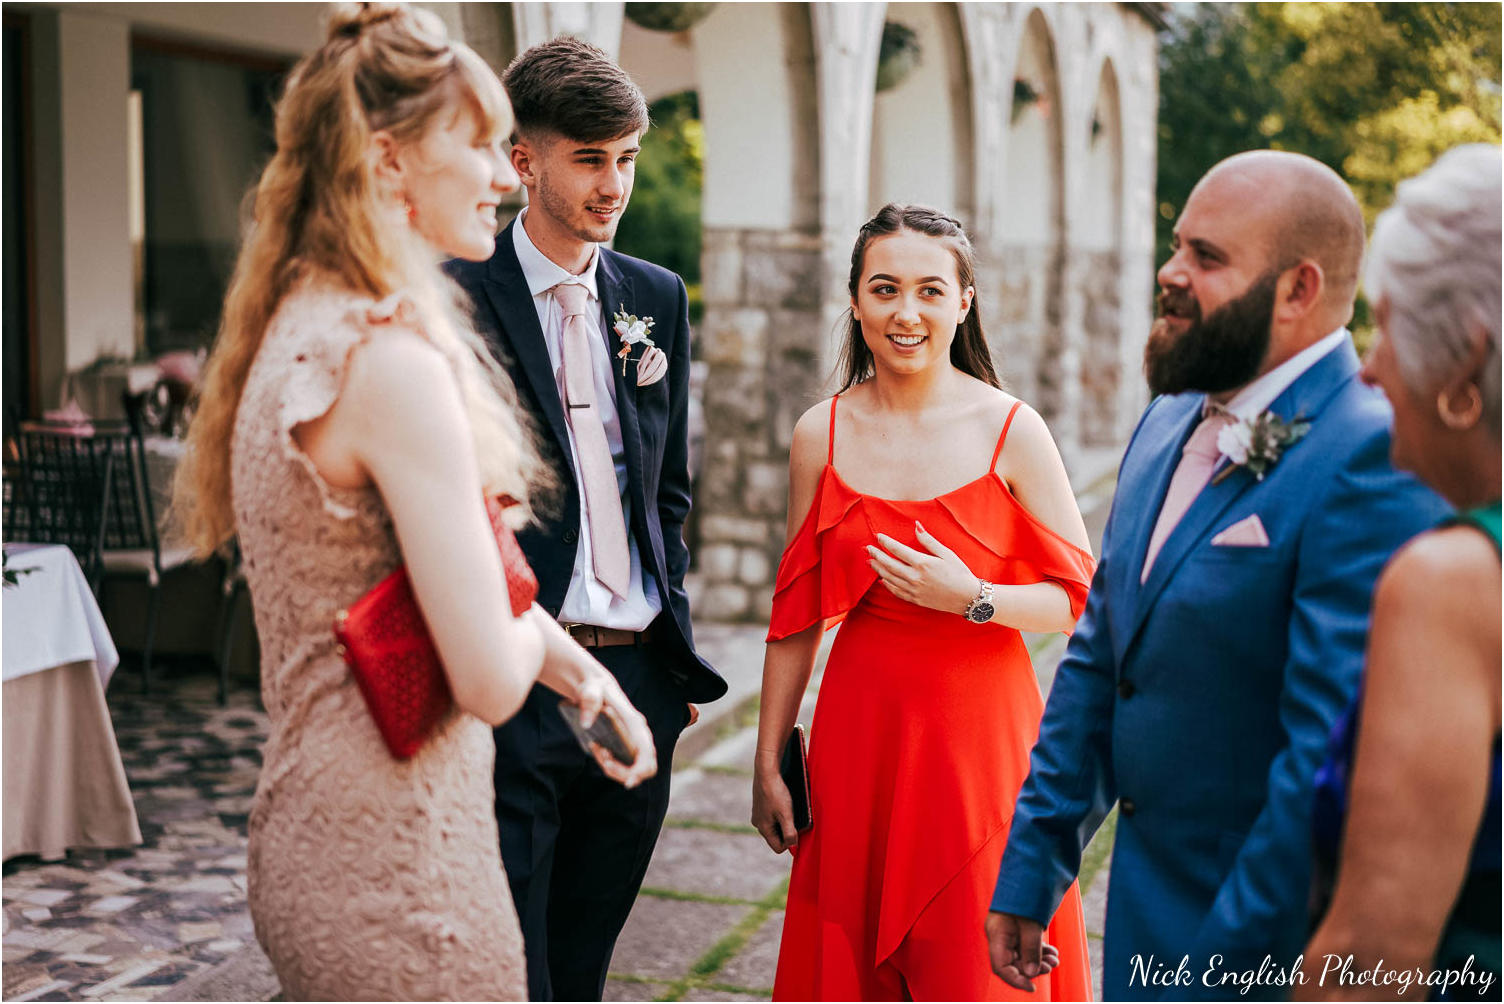 Destination_Wedding_Photographer_Slovenia_Nick_English_Photography-27.jpg